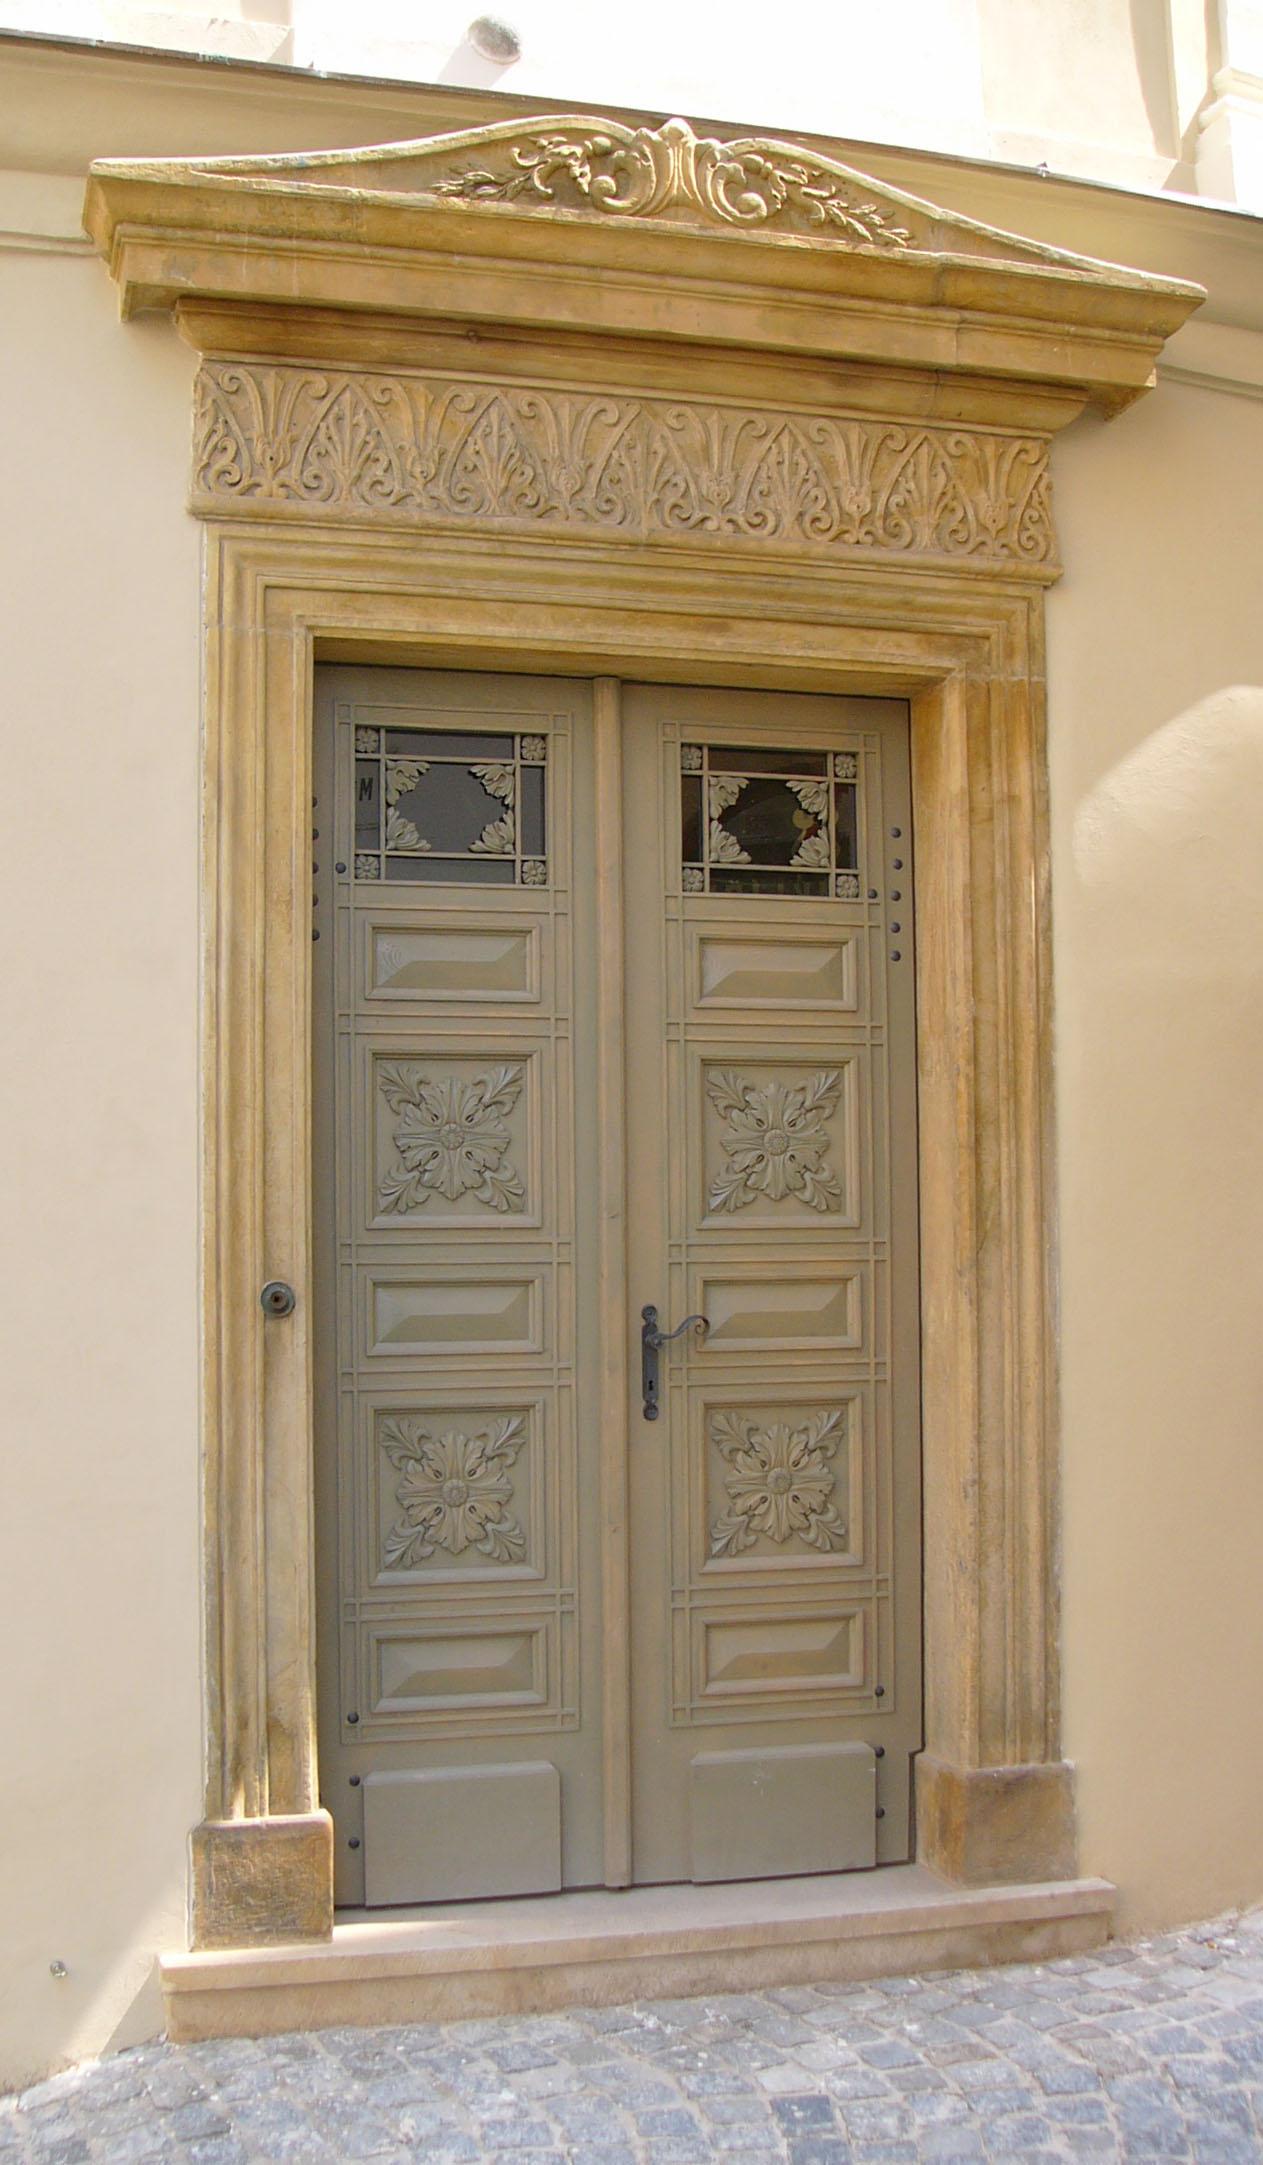 Ancient Roman Doors : Classicism definition what is